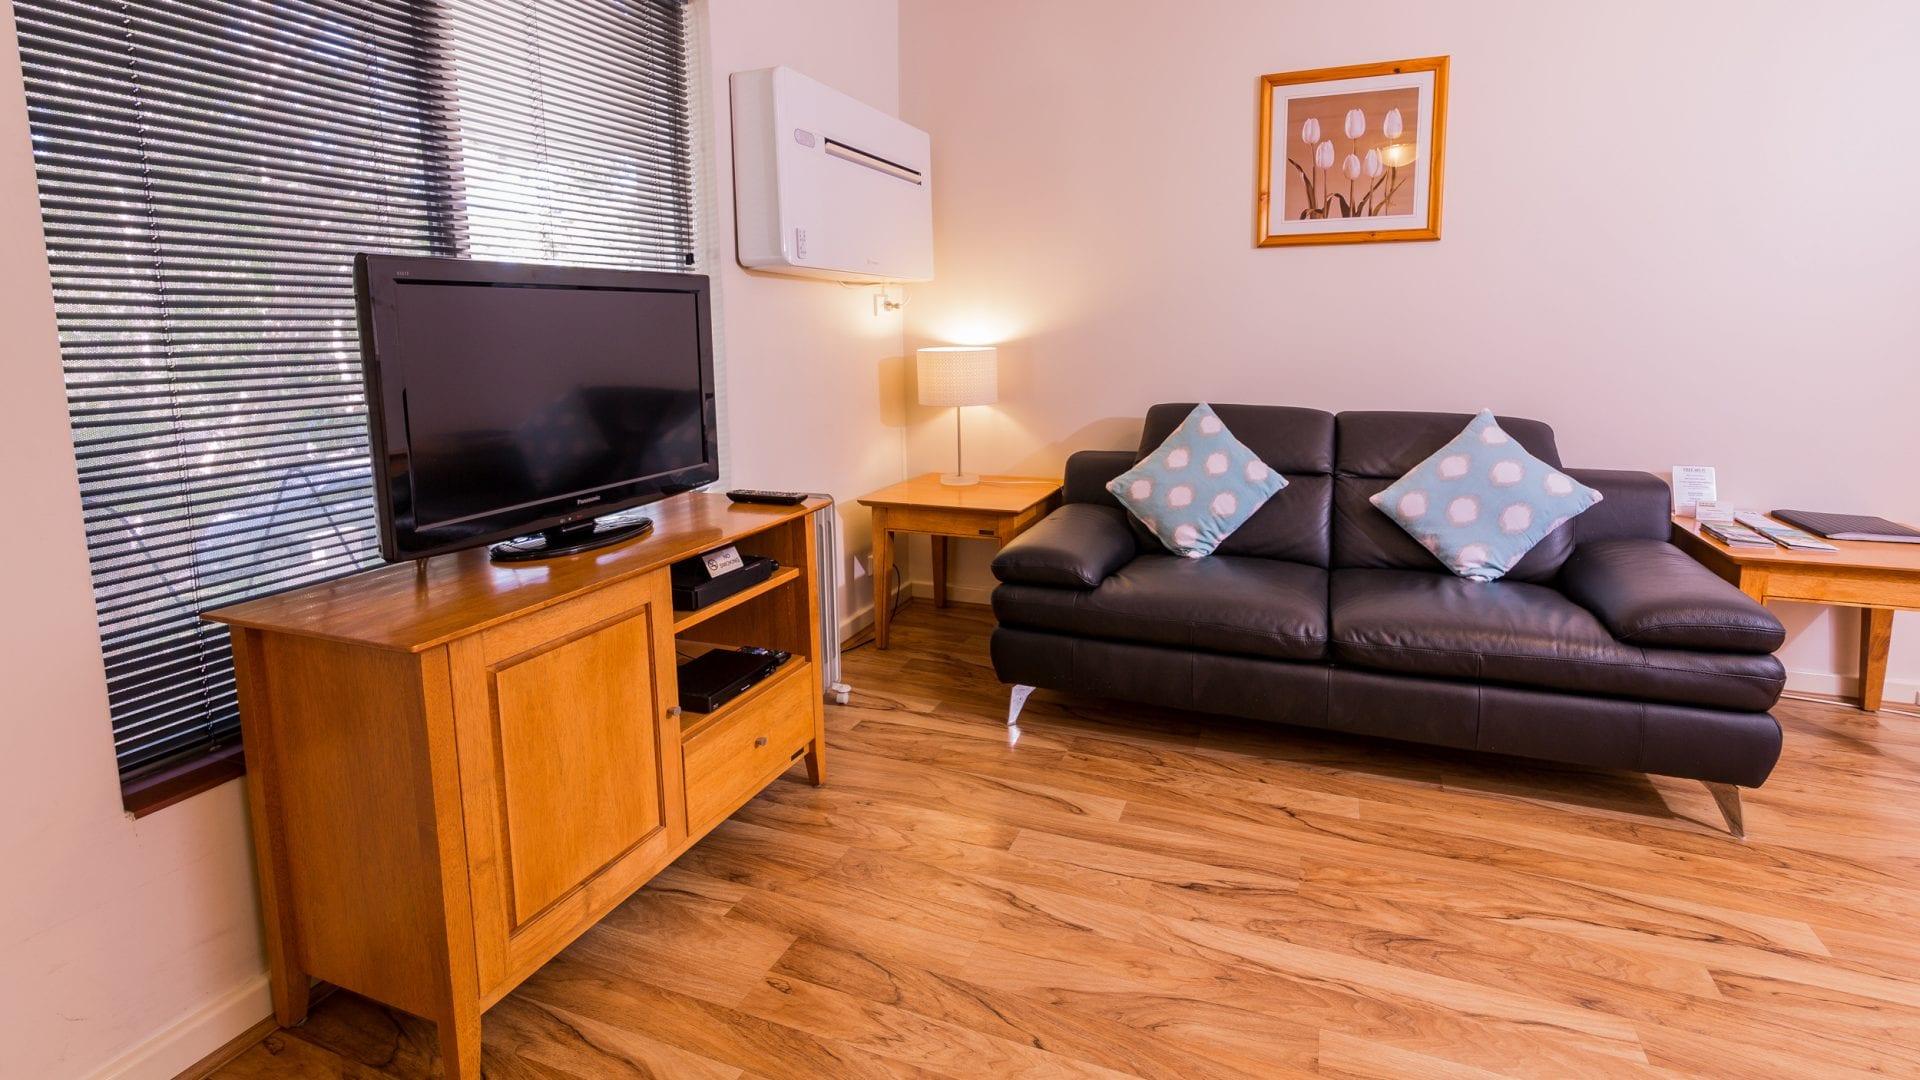 livingroom6-1920x1080